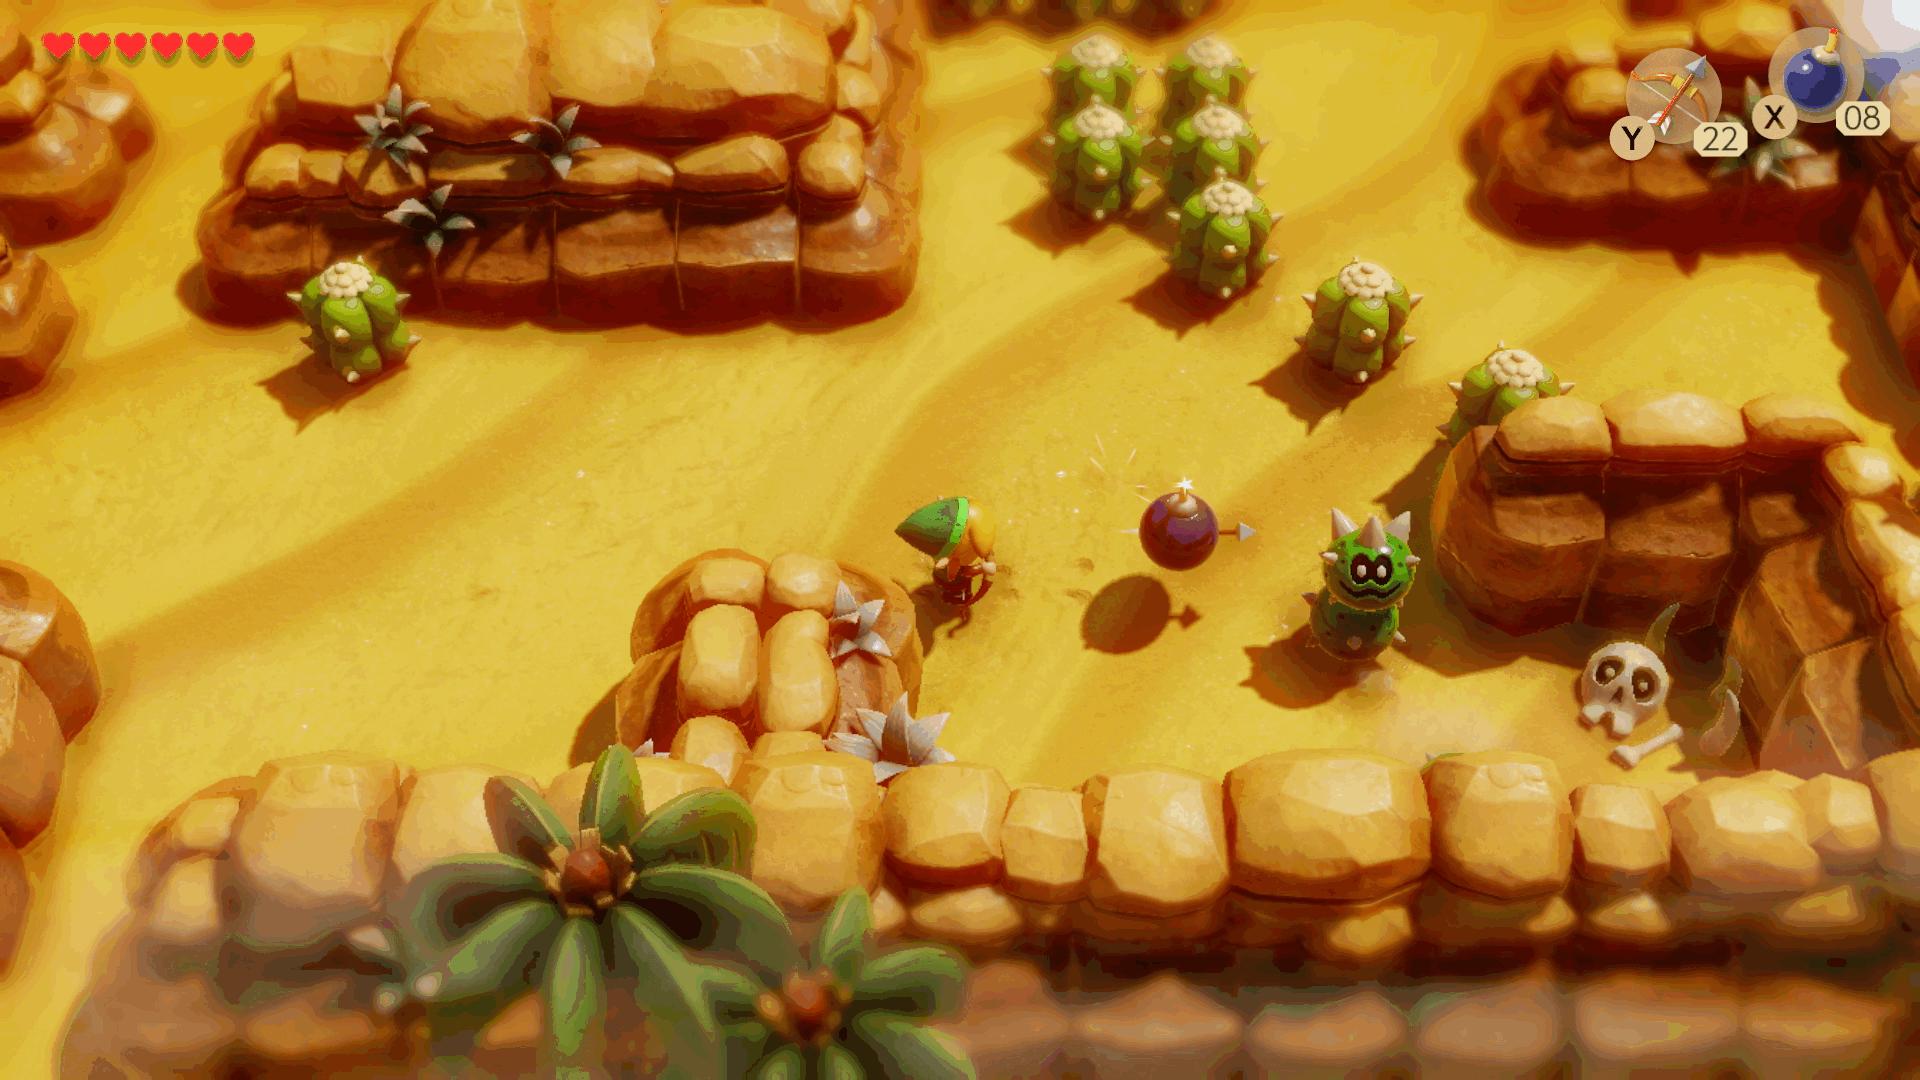 The Legend Of Zelda Link S Awakening Remake Comes Out On